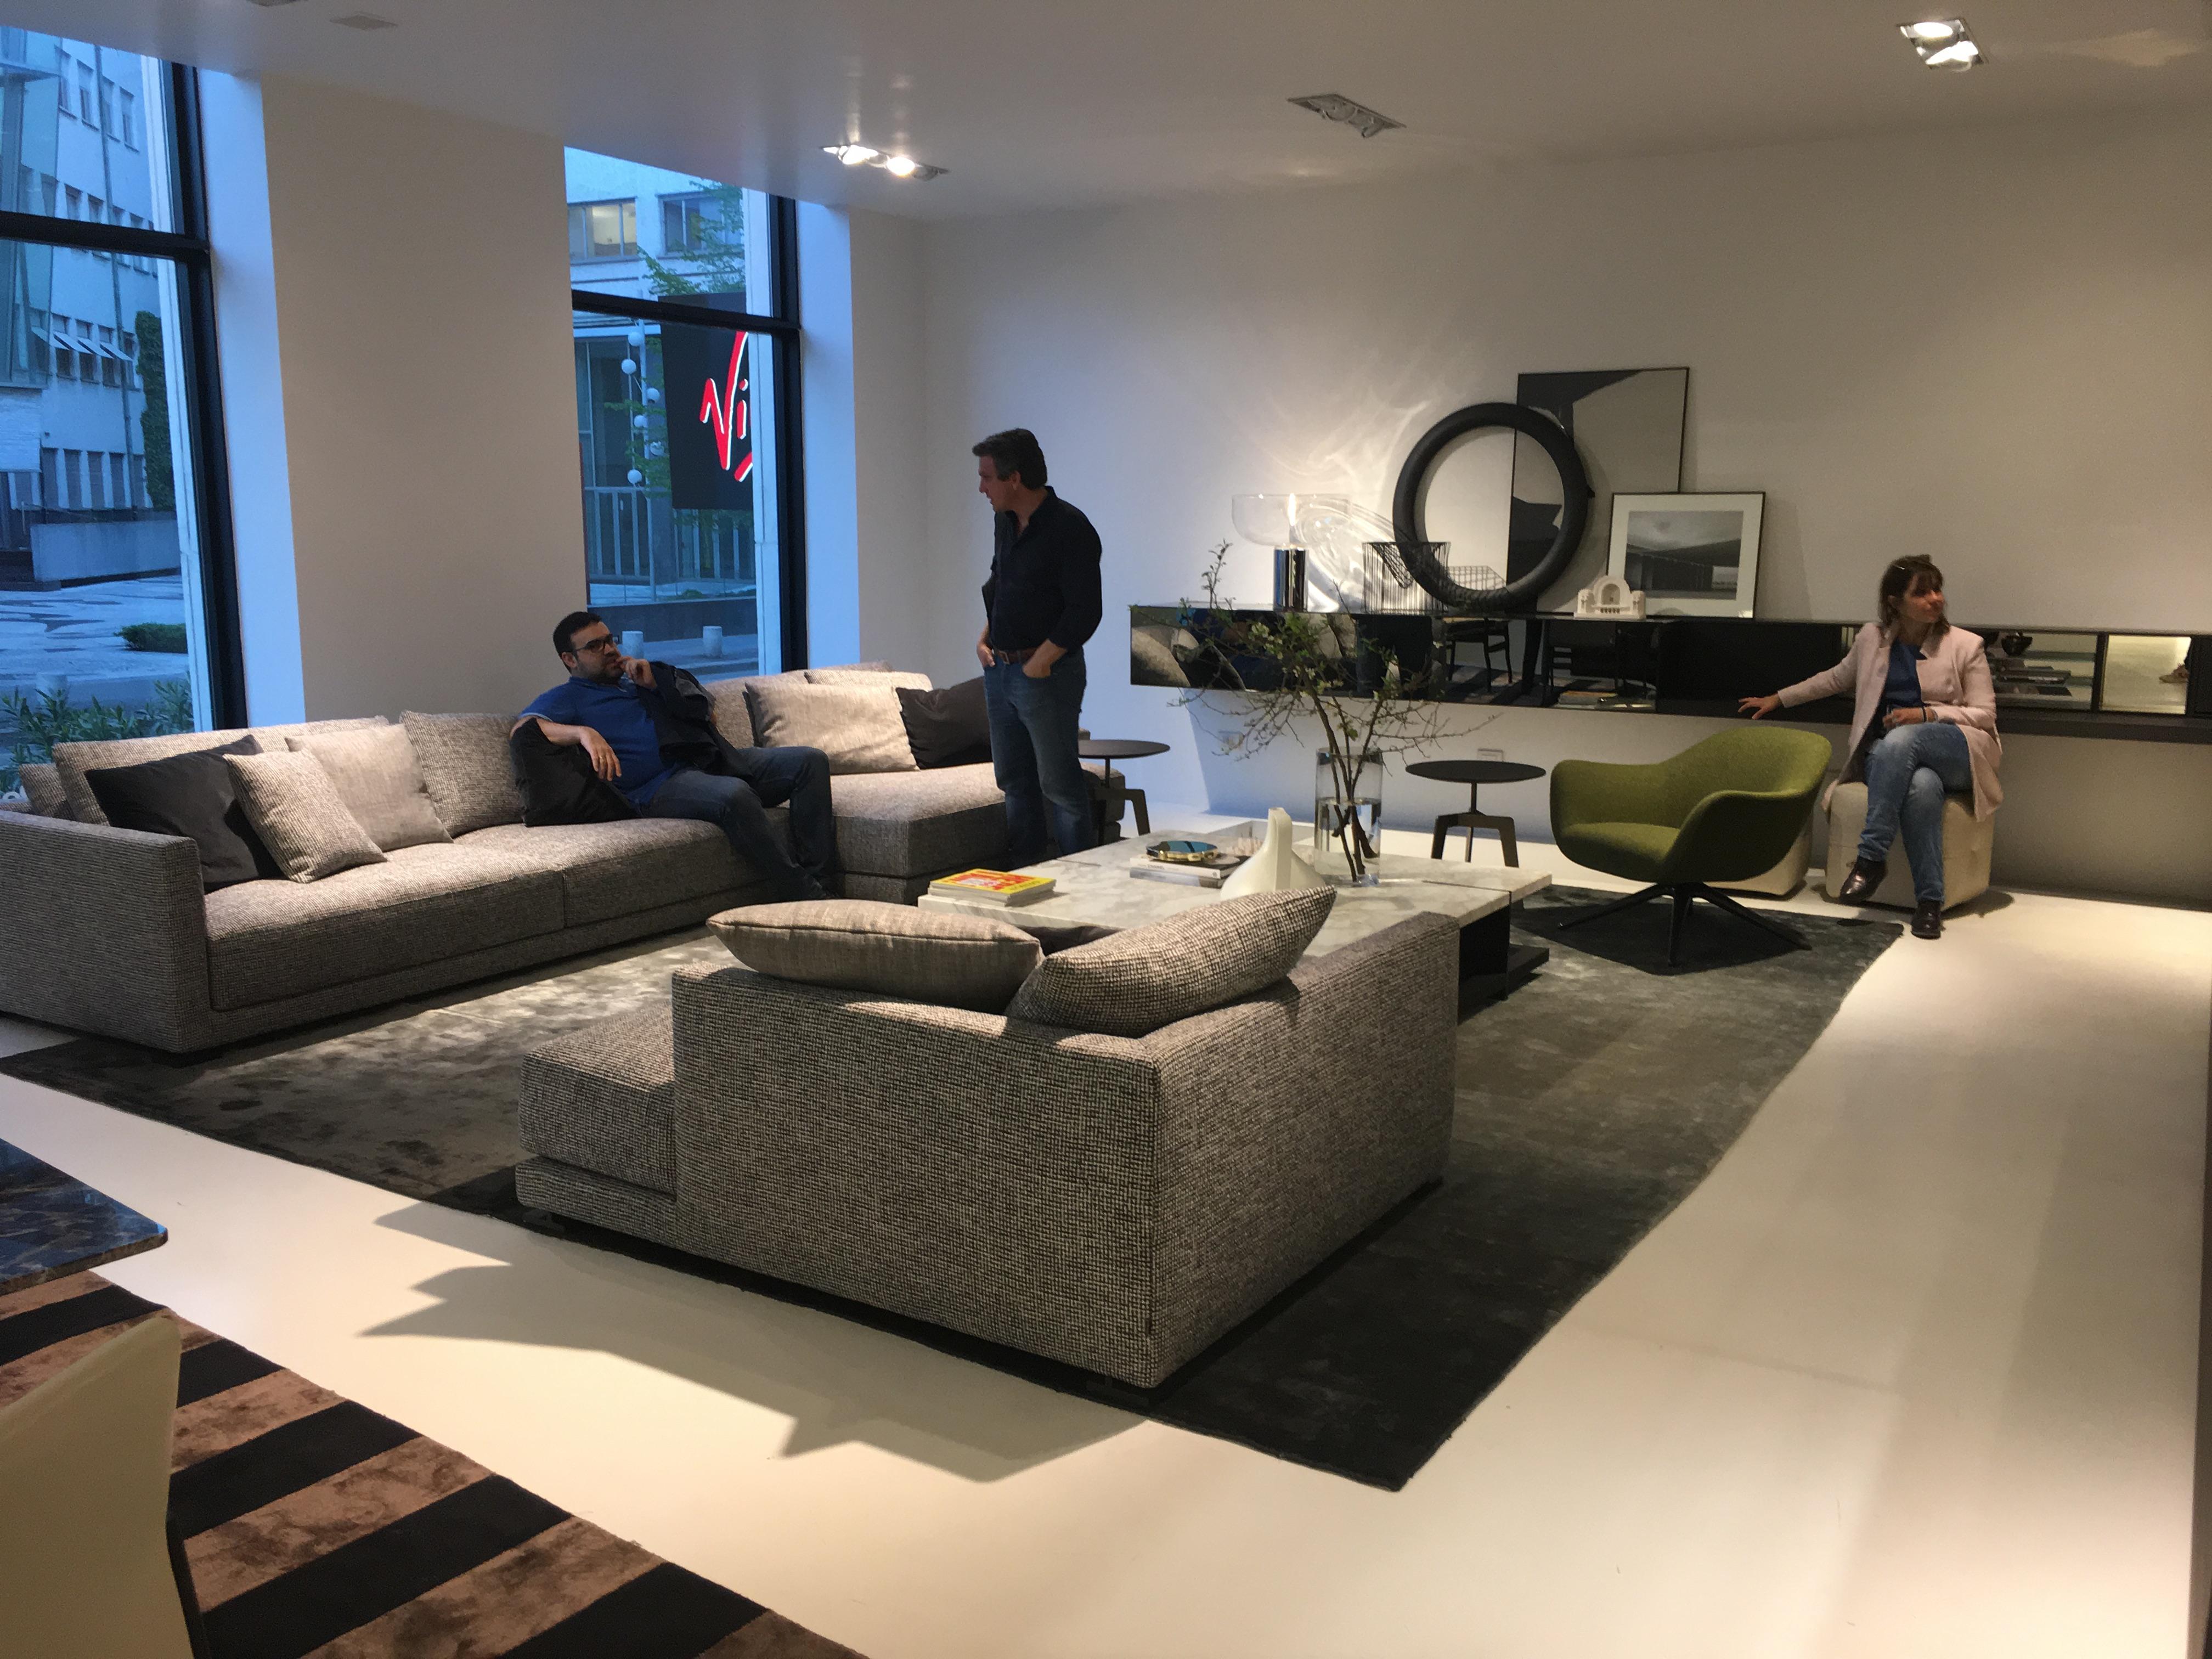 Feria del mueble de mil n 2017 muebles gasc n el blog - Feria del mueble milan ...